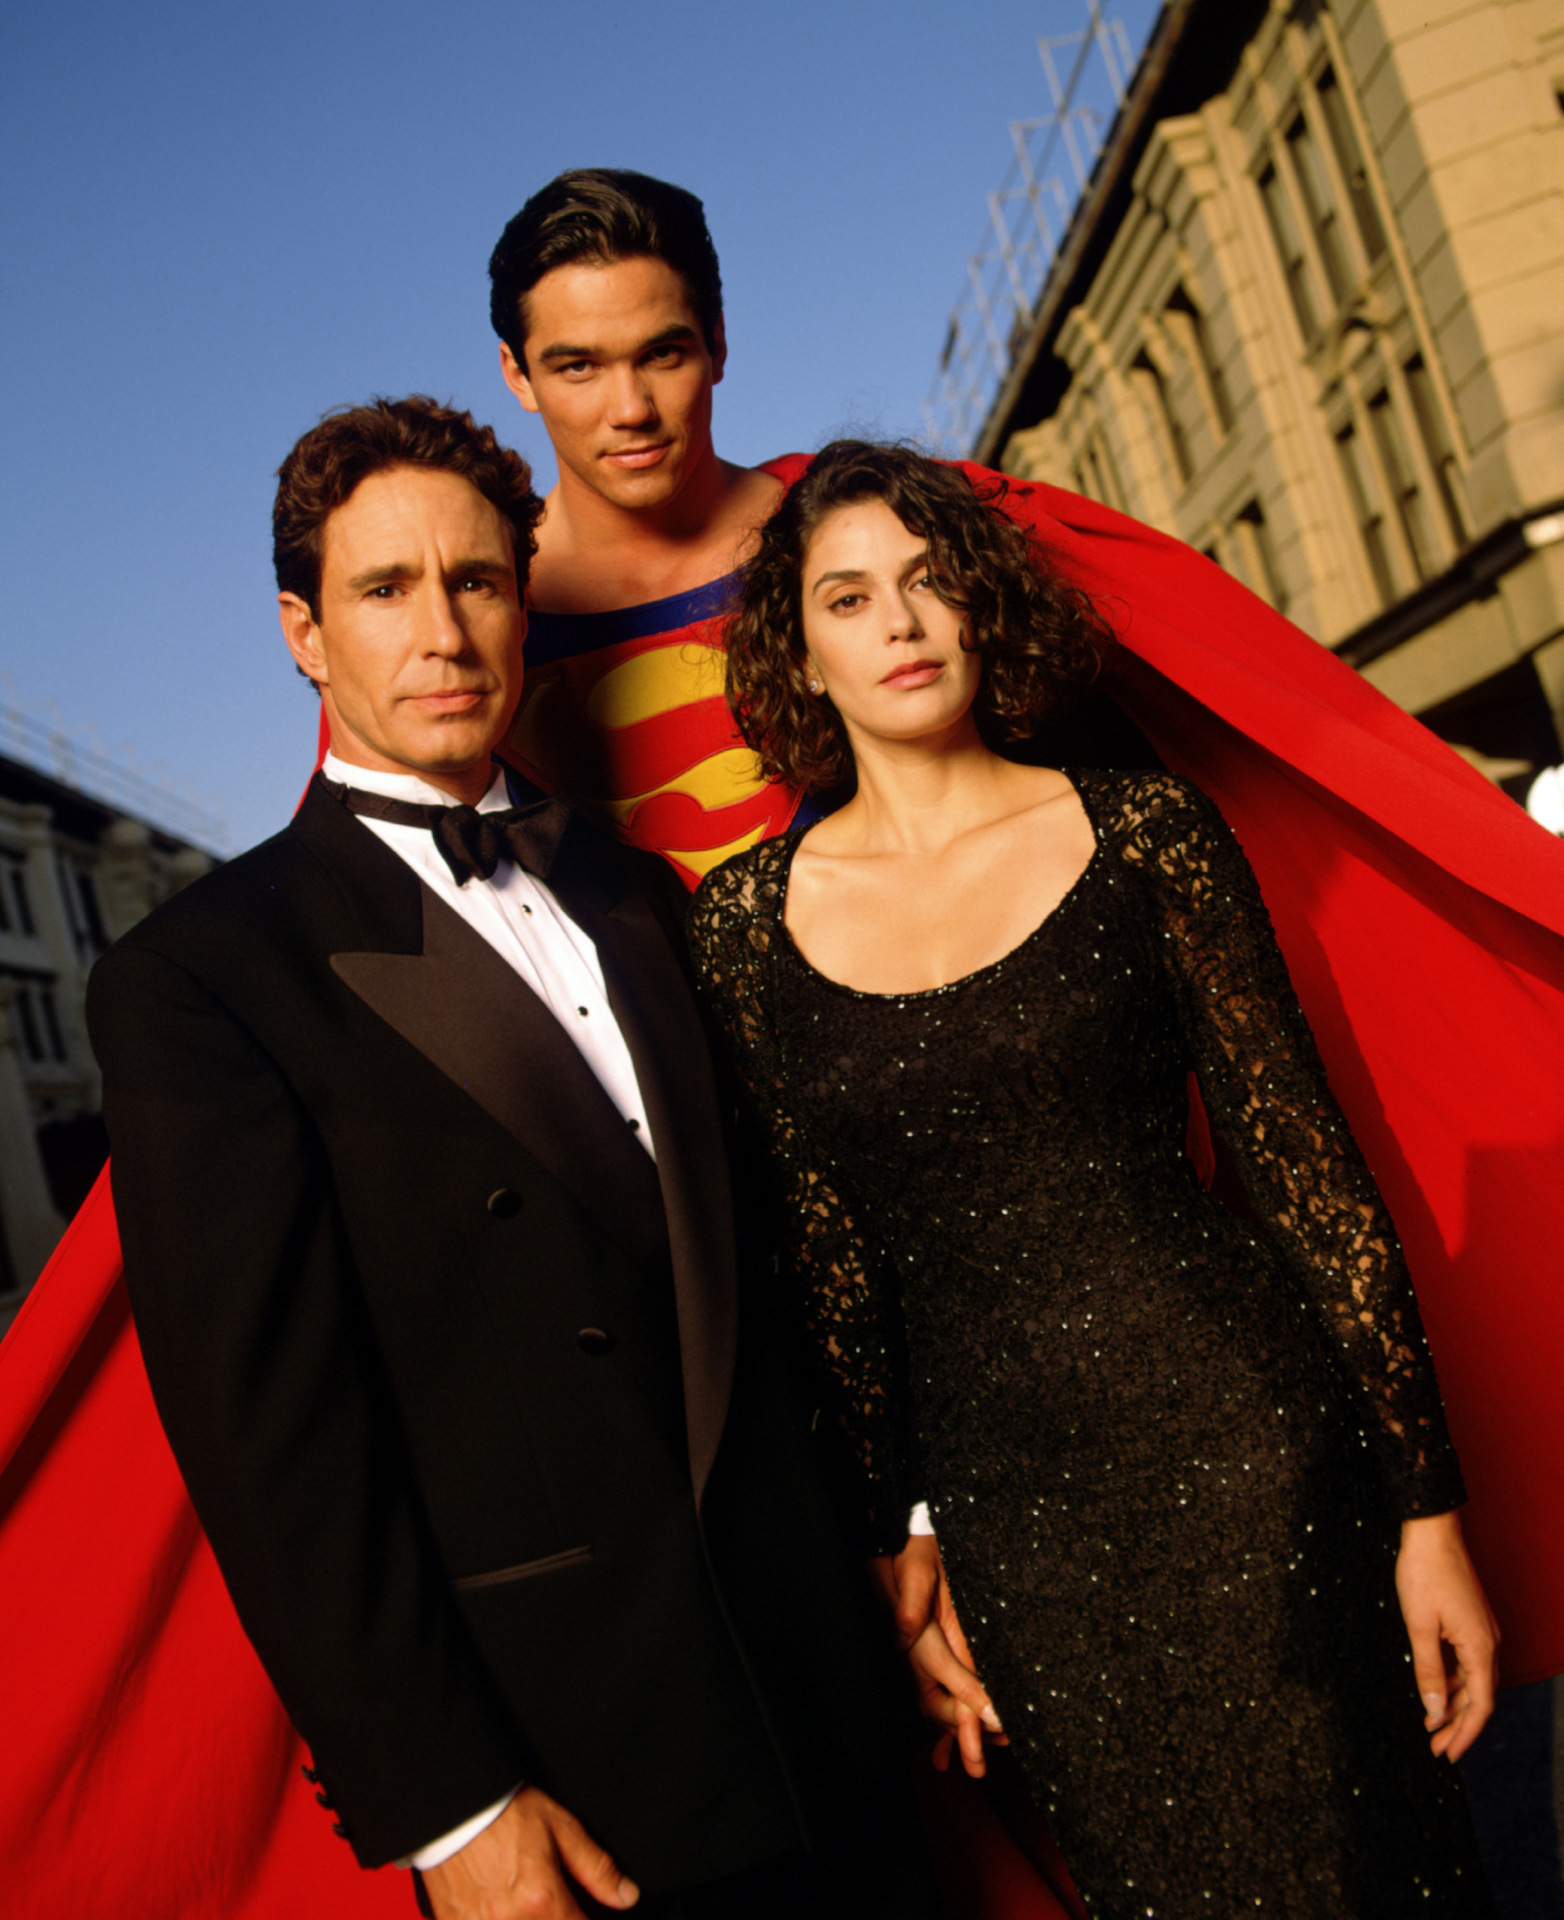 Smallville Season 4 Cast: Image - Cast-lois-and-clark-162494 1564 1920.jpg